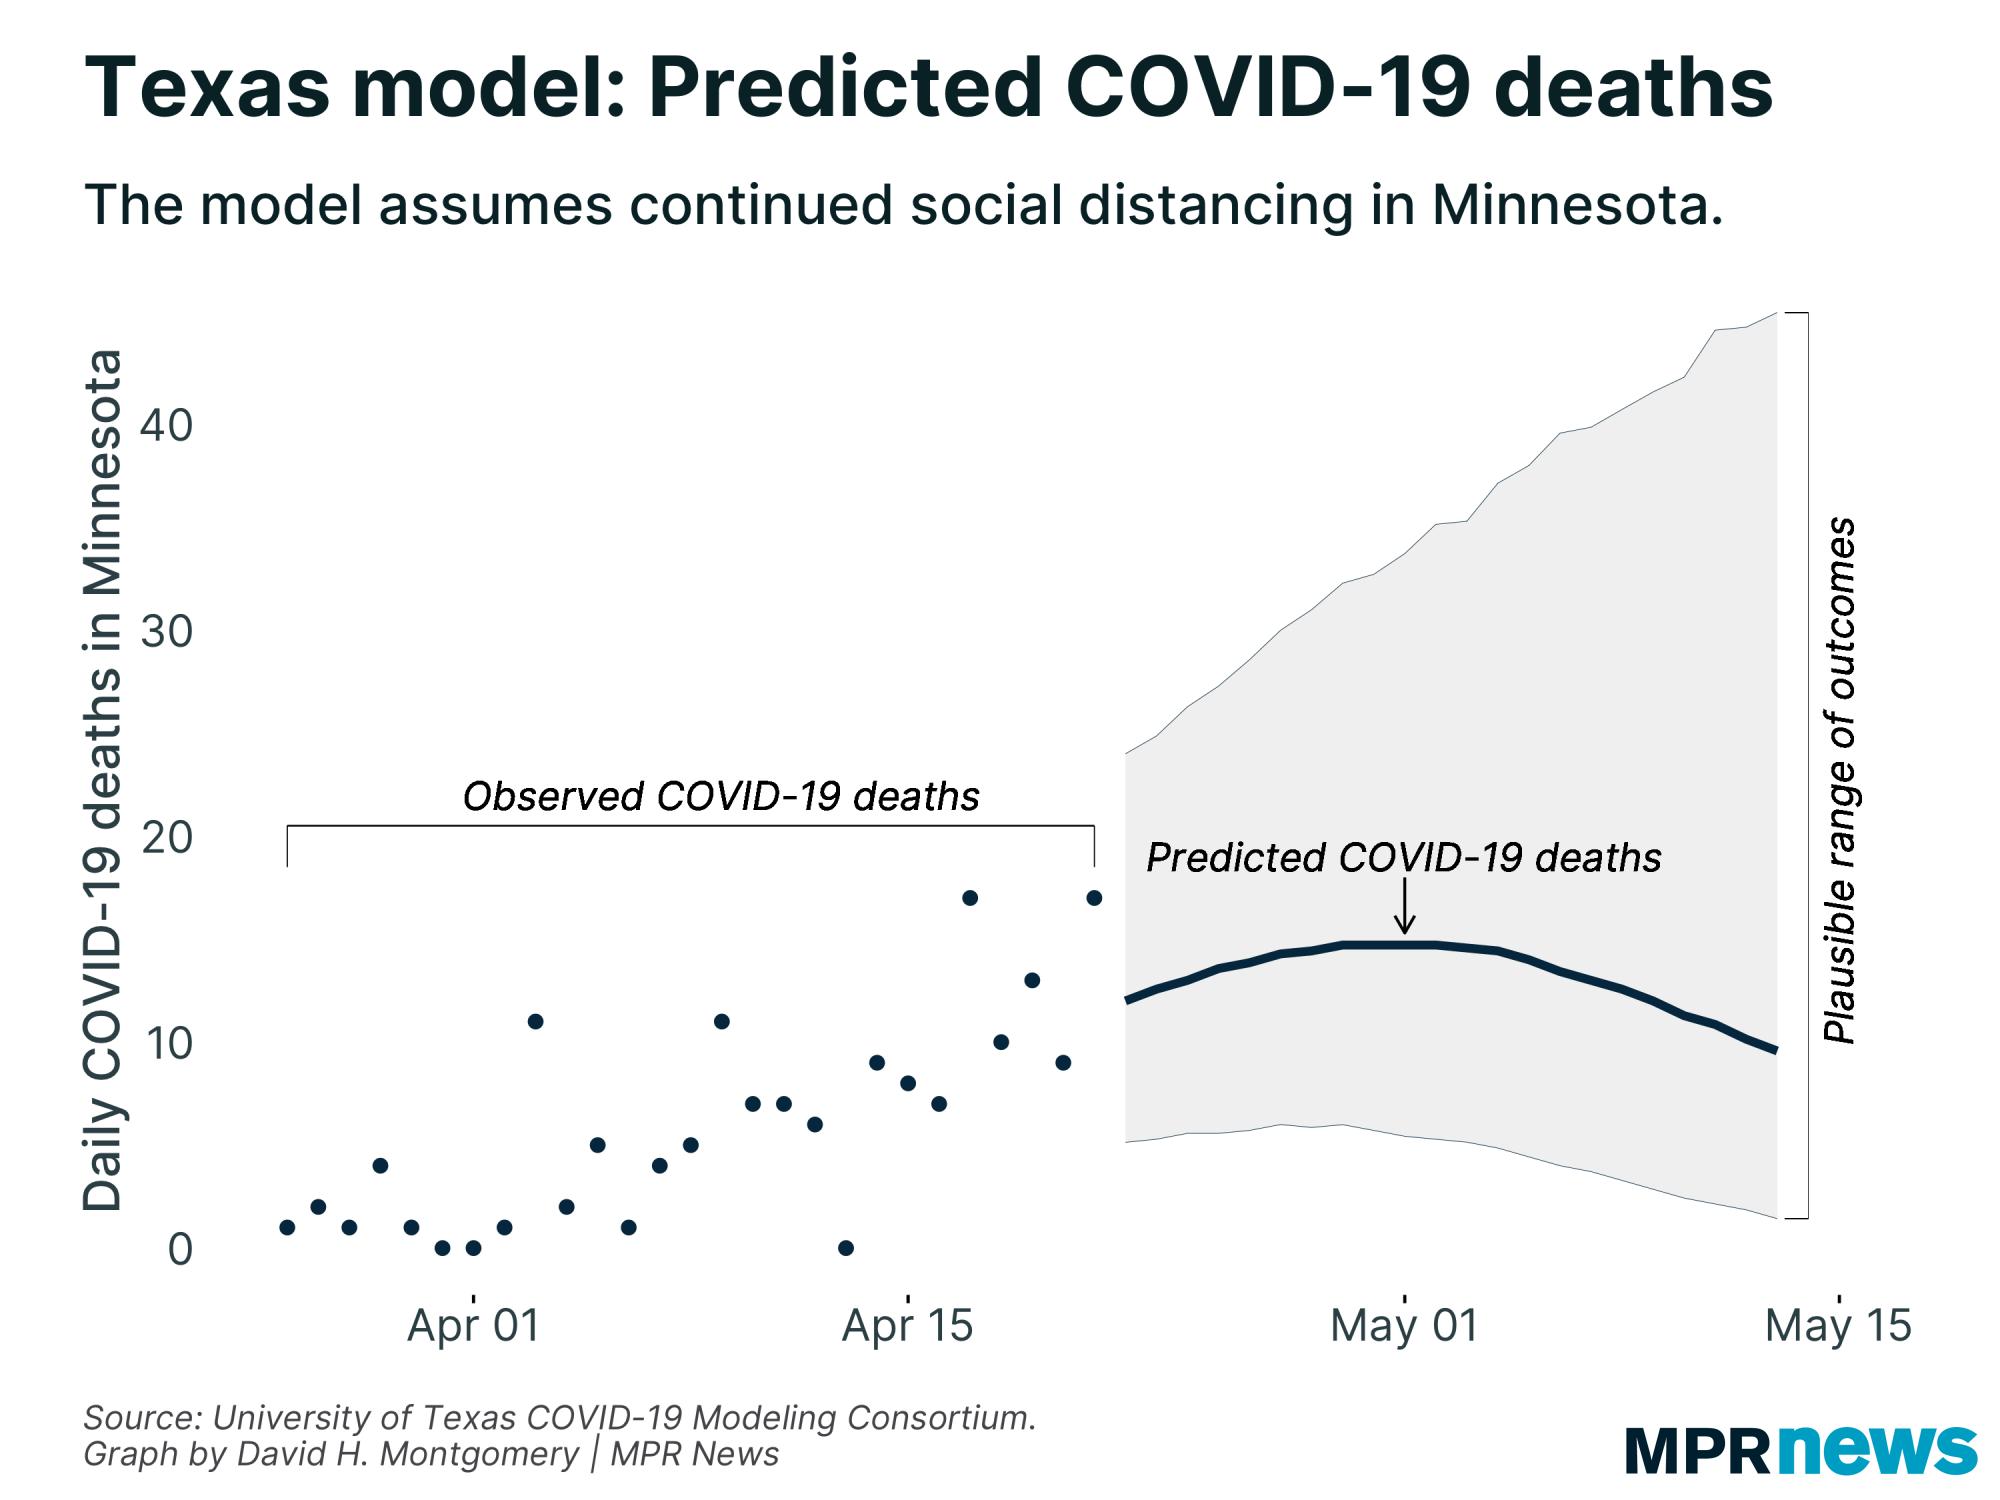 The University of Texas' COVID-19 model predictions